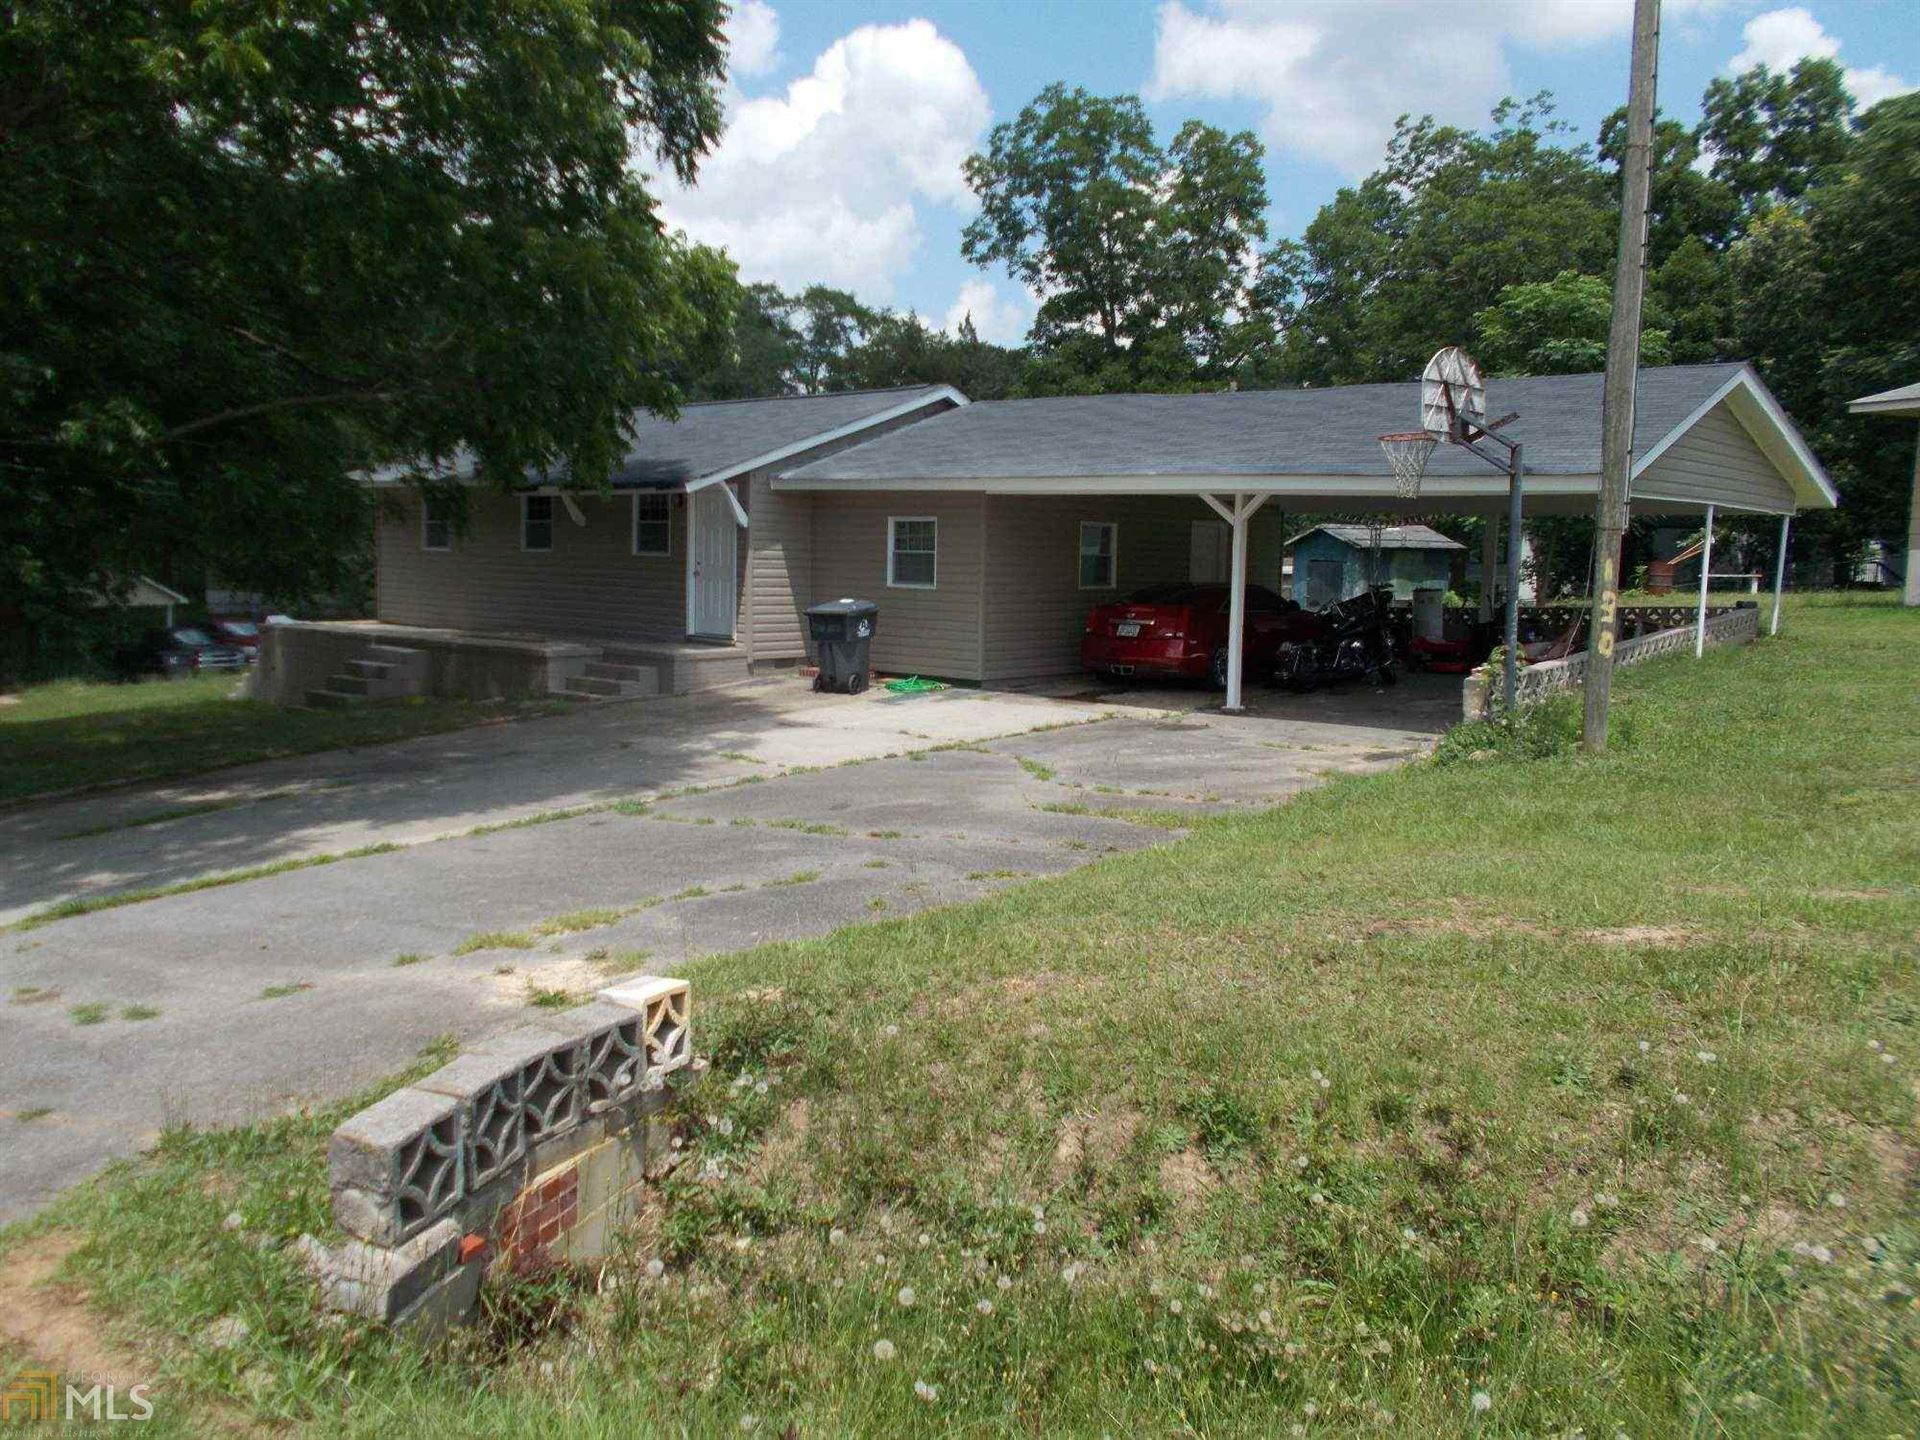 130 & 138 Stuart Cir, Milledgeville, GA 31061 - #: 8814631